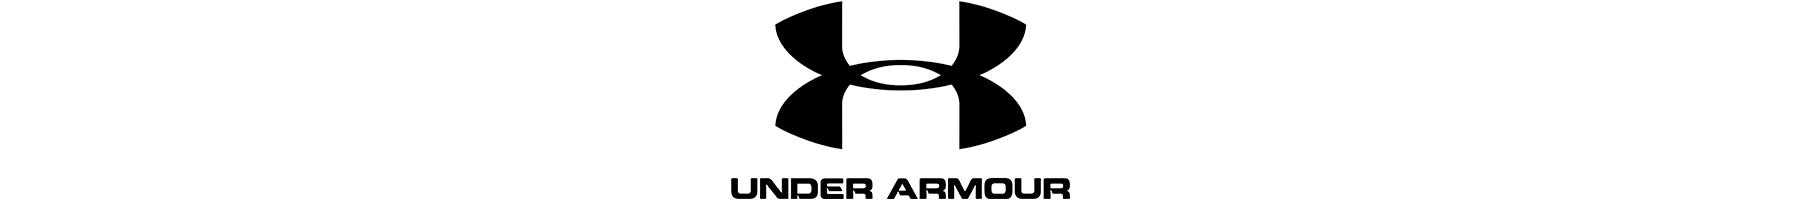 DrJays.com - Under Armour